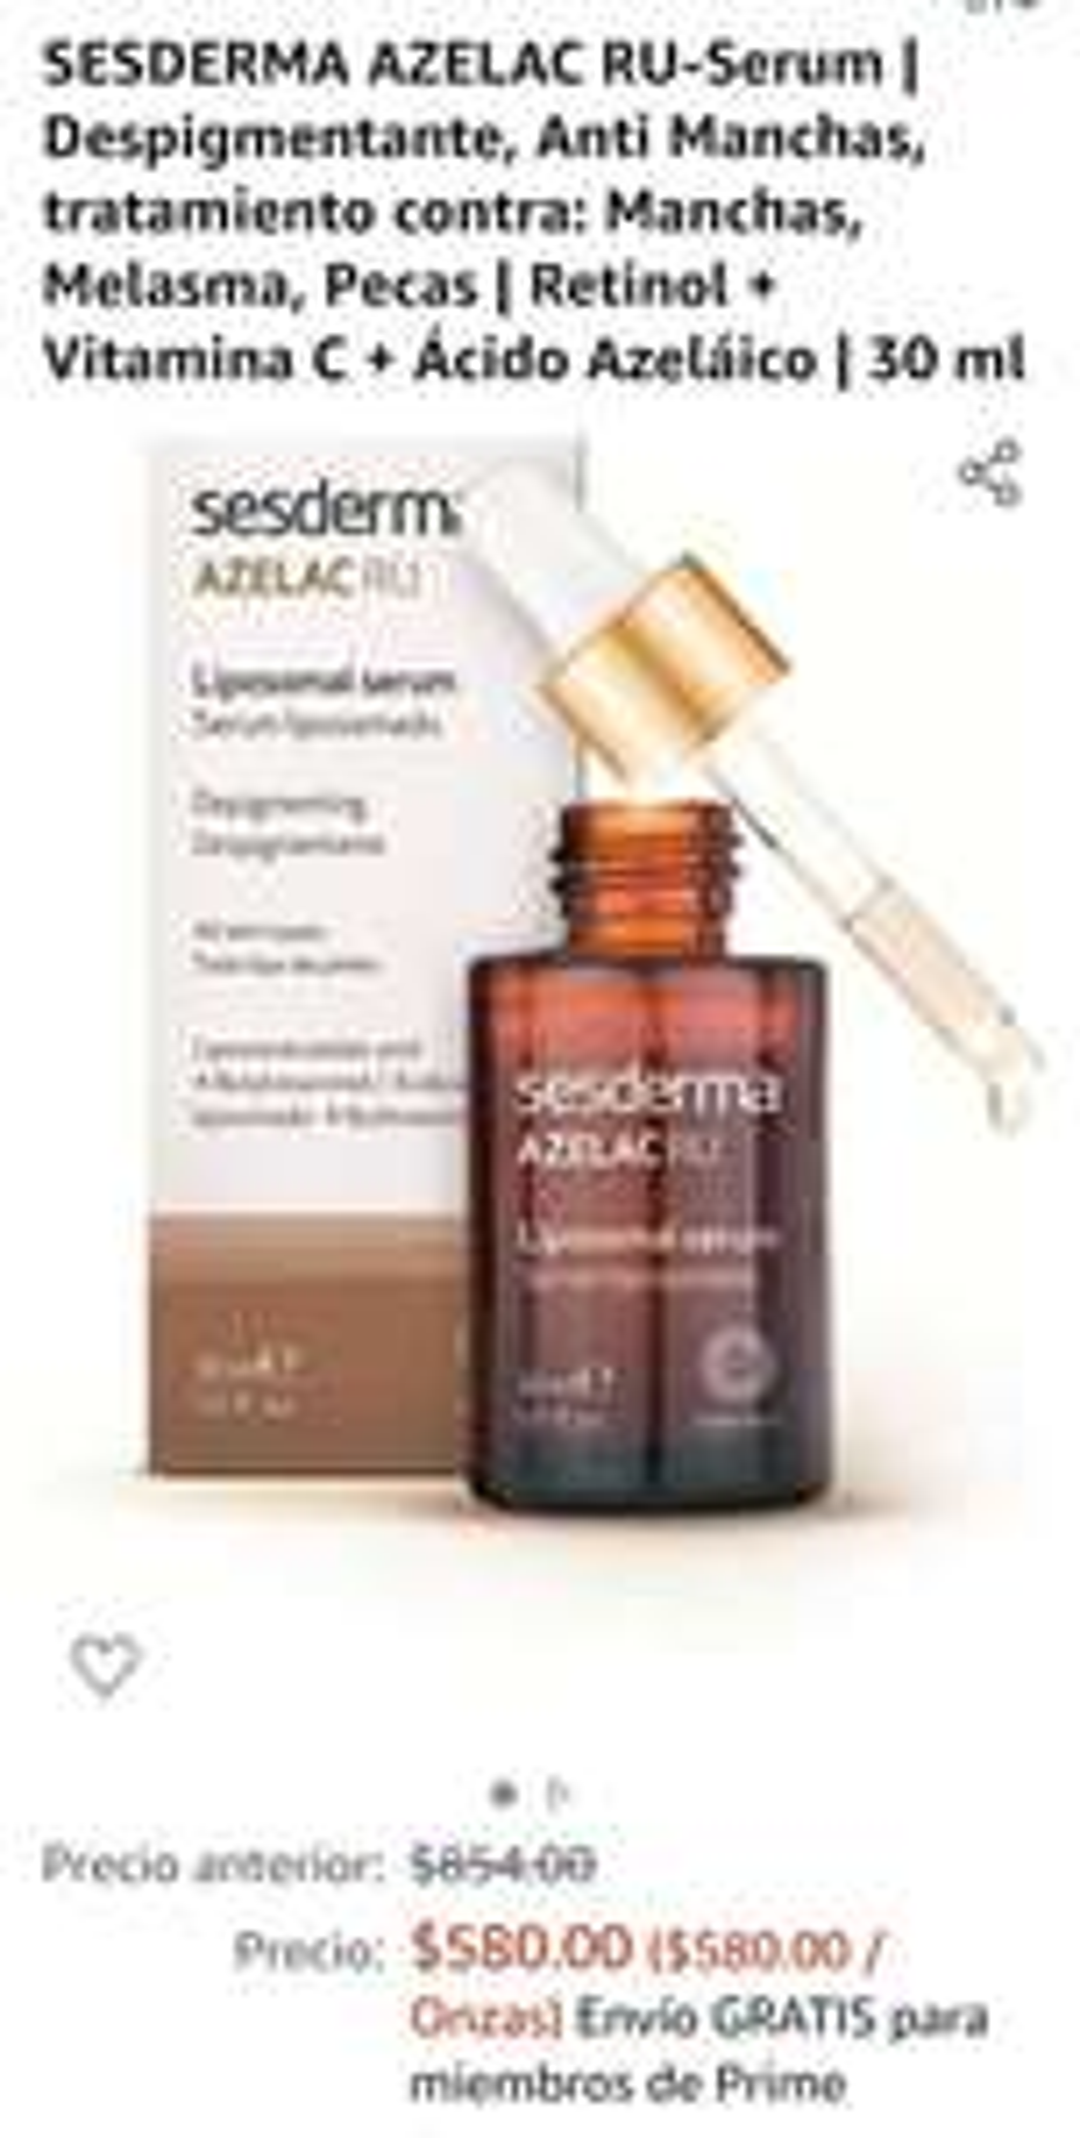 Amazon: SESDERMA AZELAC RU-Serum | Despigmentante